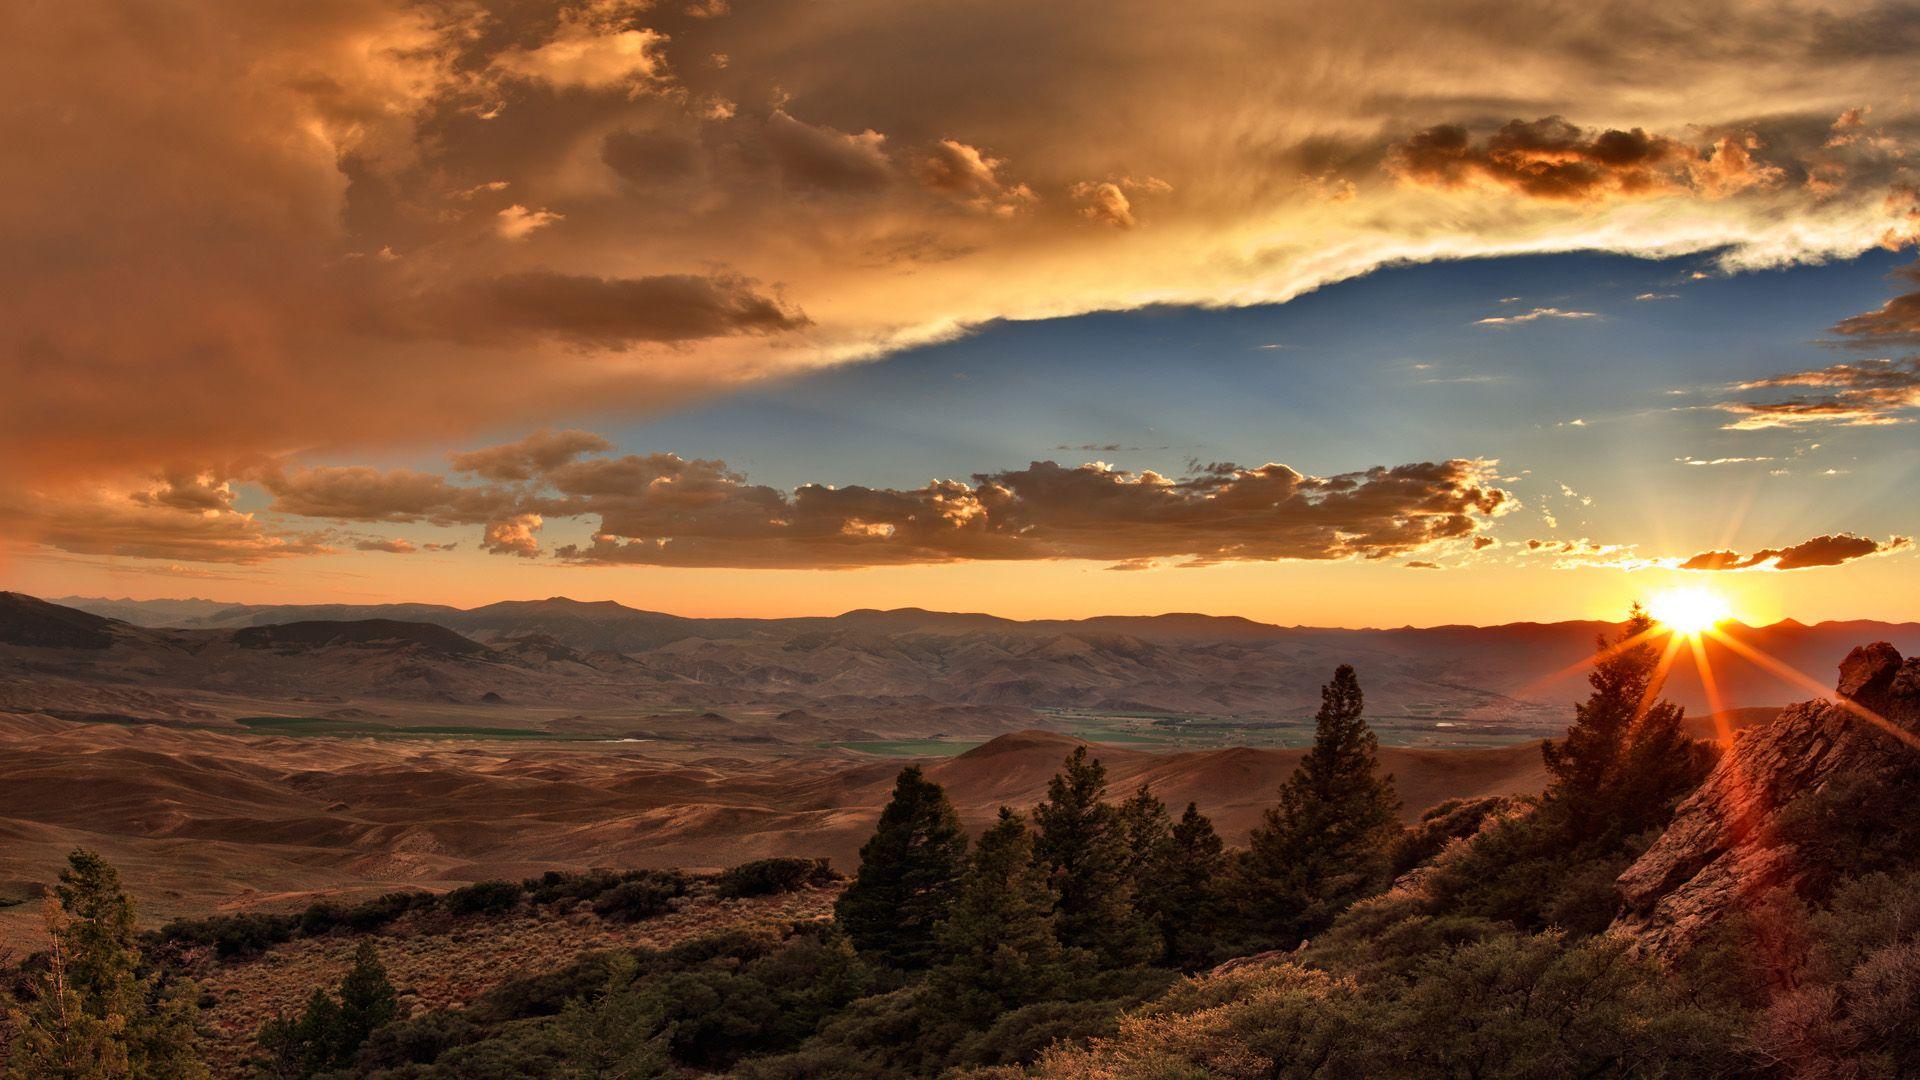 Pin By Katelyn Adams On Sunsets Sunrise Photos Sunset Wallpaper Beautiful Landscape Photography